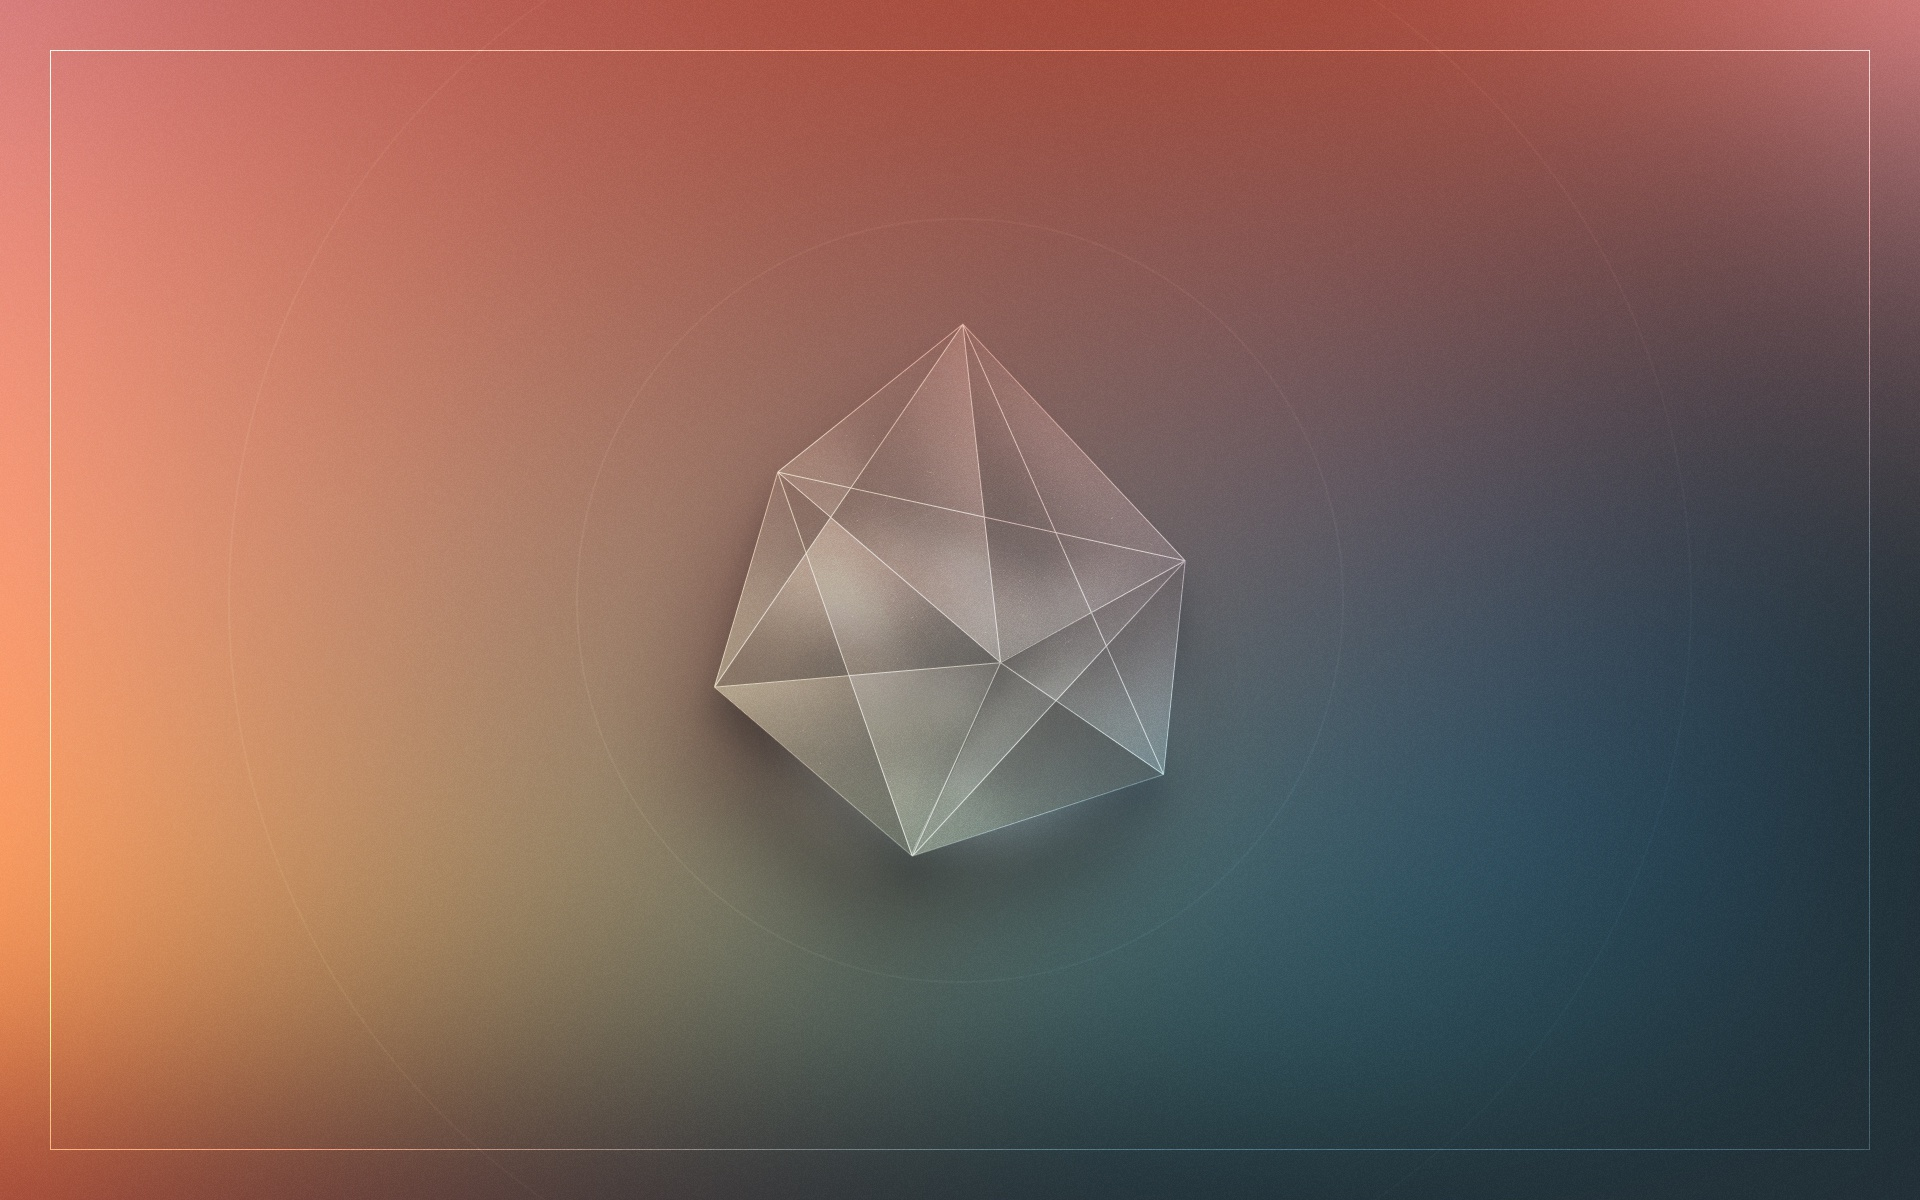 Crystal 1920x1200